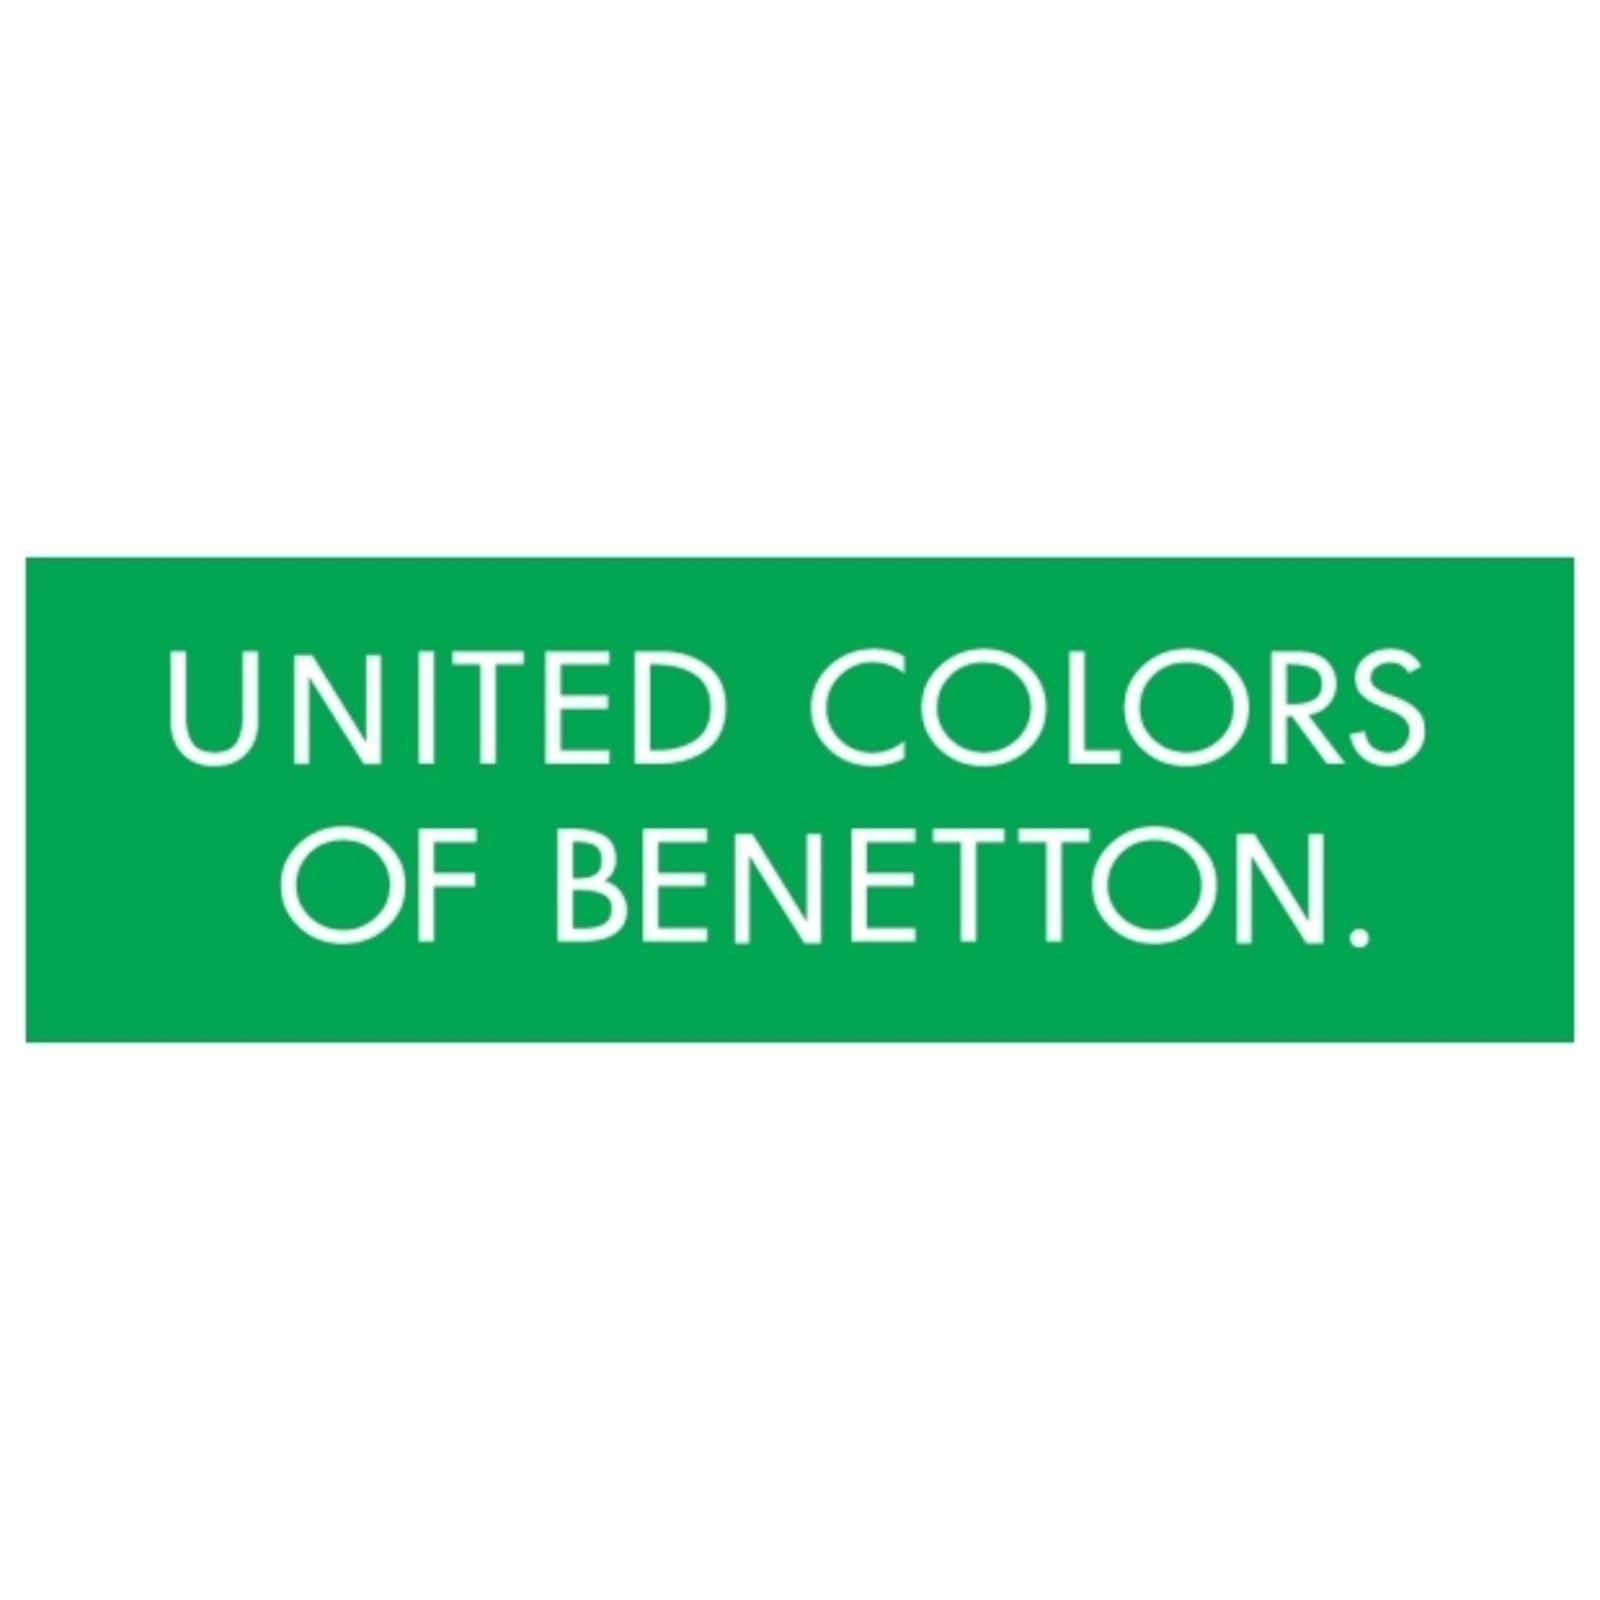 UNITED COLORS OF BENETTON (Bild 1)